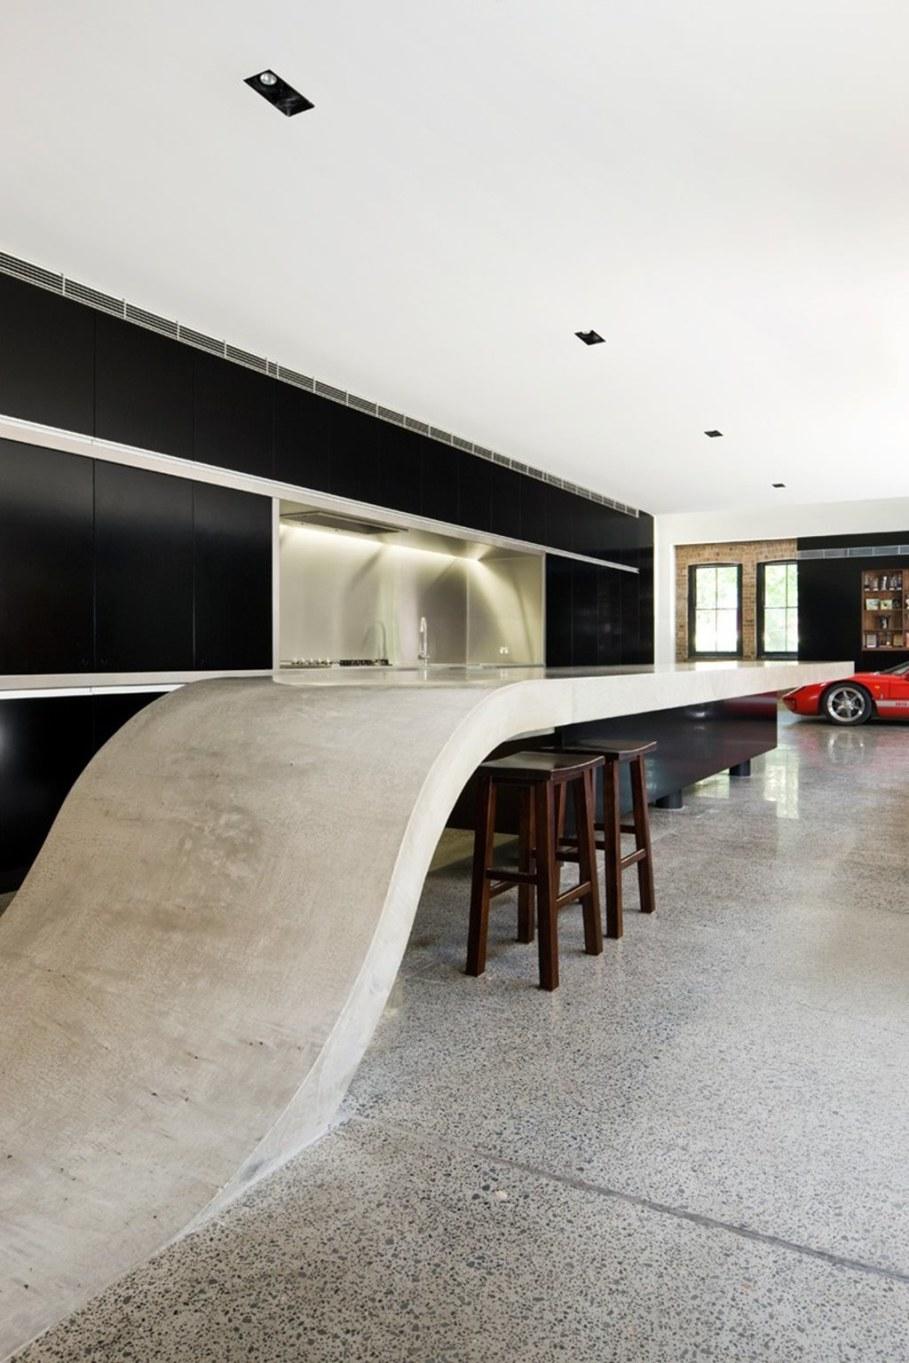 Grand loft house in Australia by Corben Architects studio - Kitchen 3